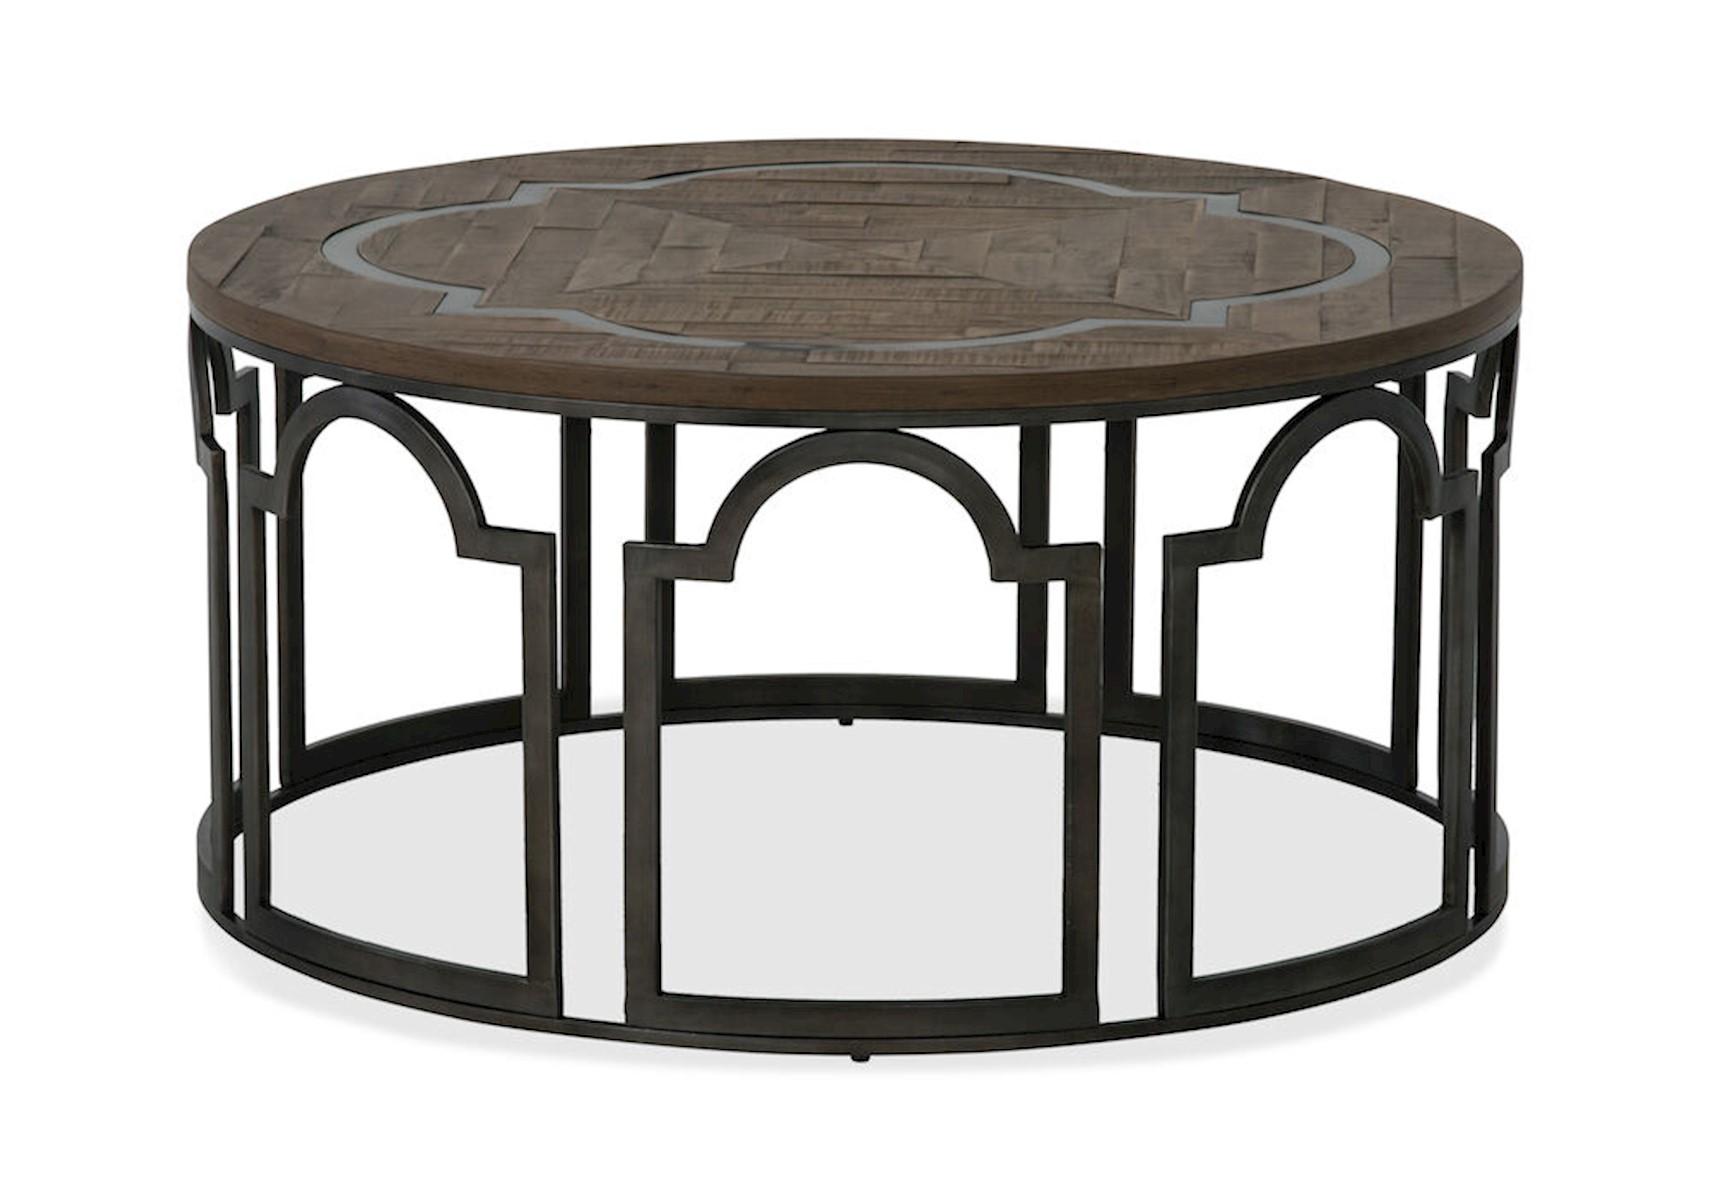 Estelle Coffee Table